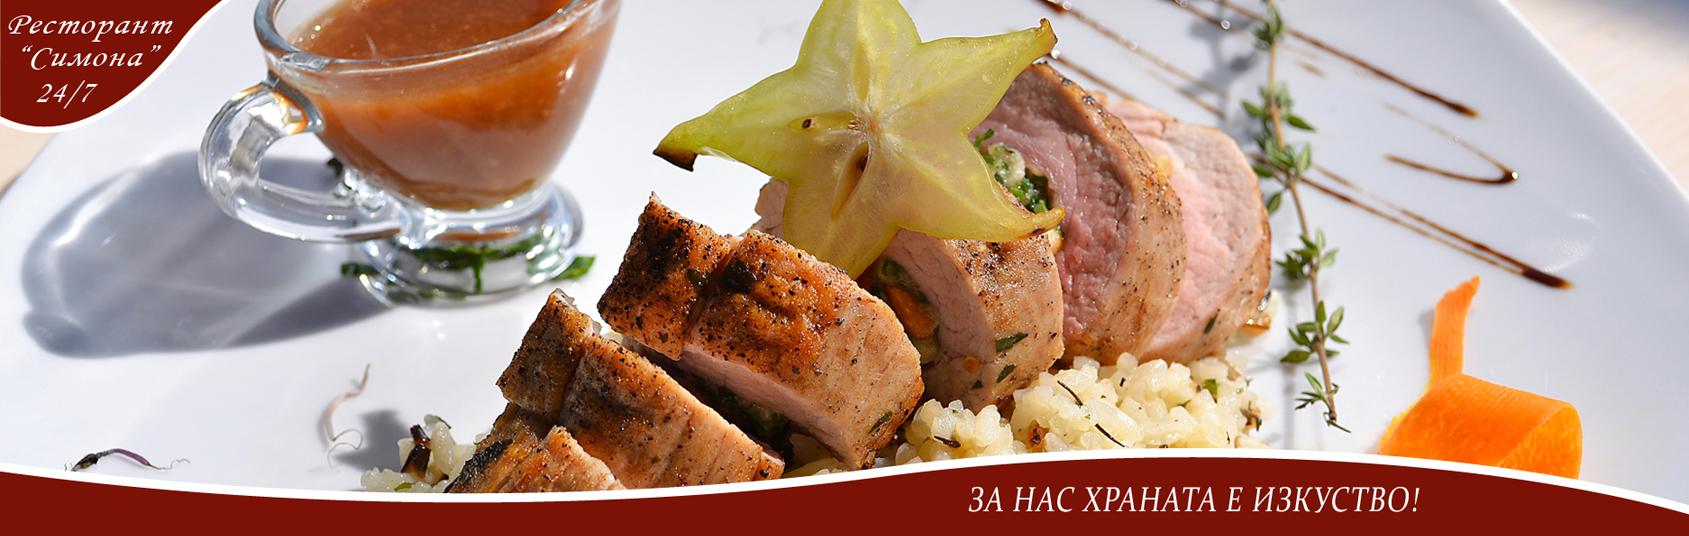 Ресторанти в София - Ресторант Симона